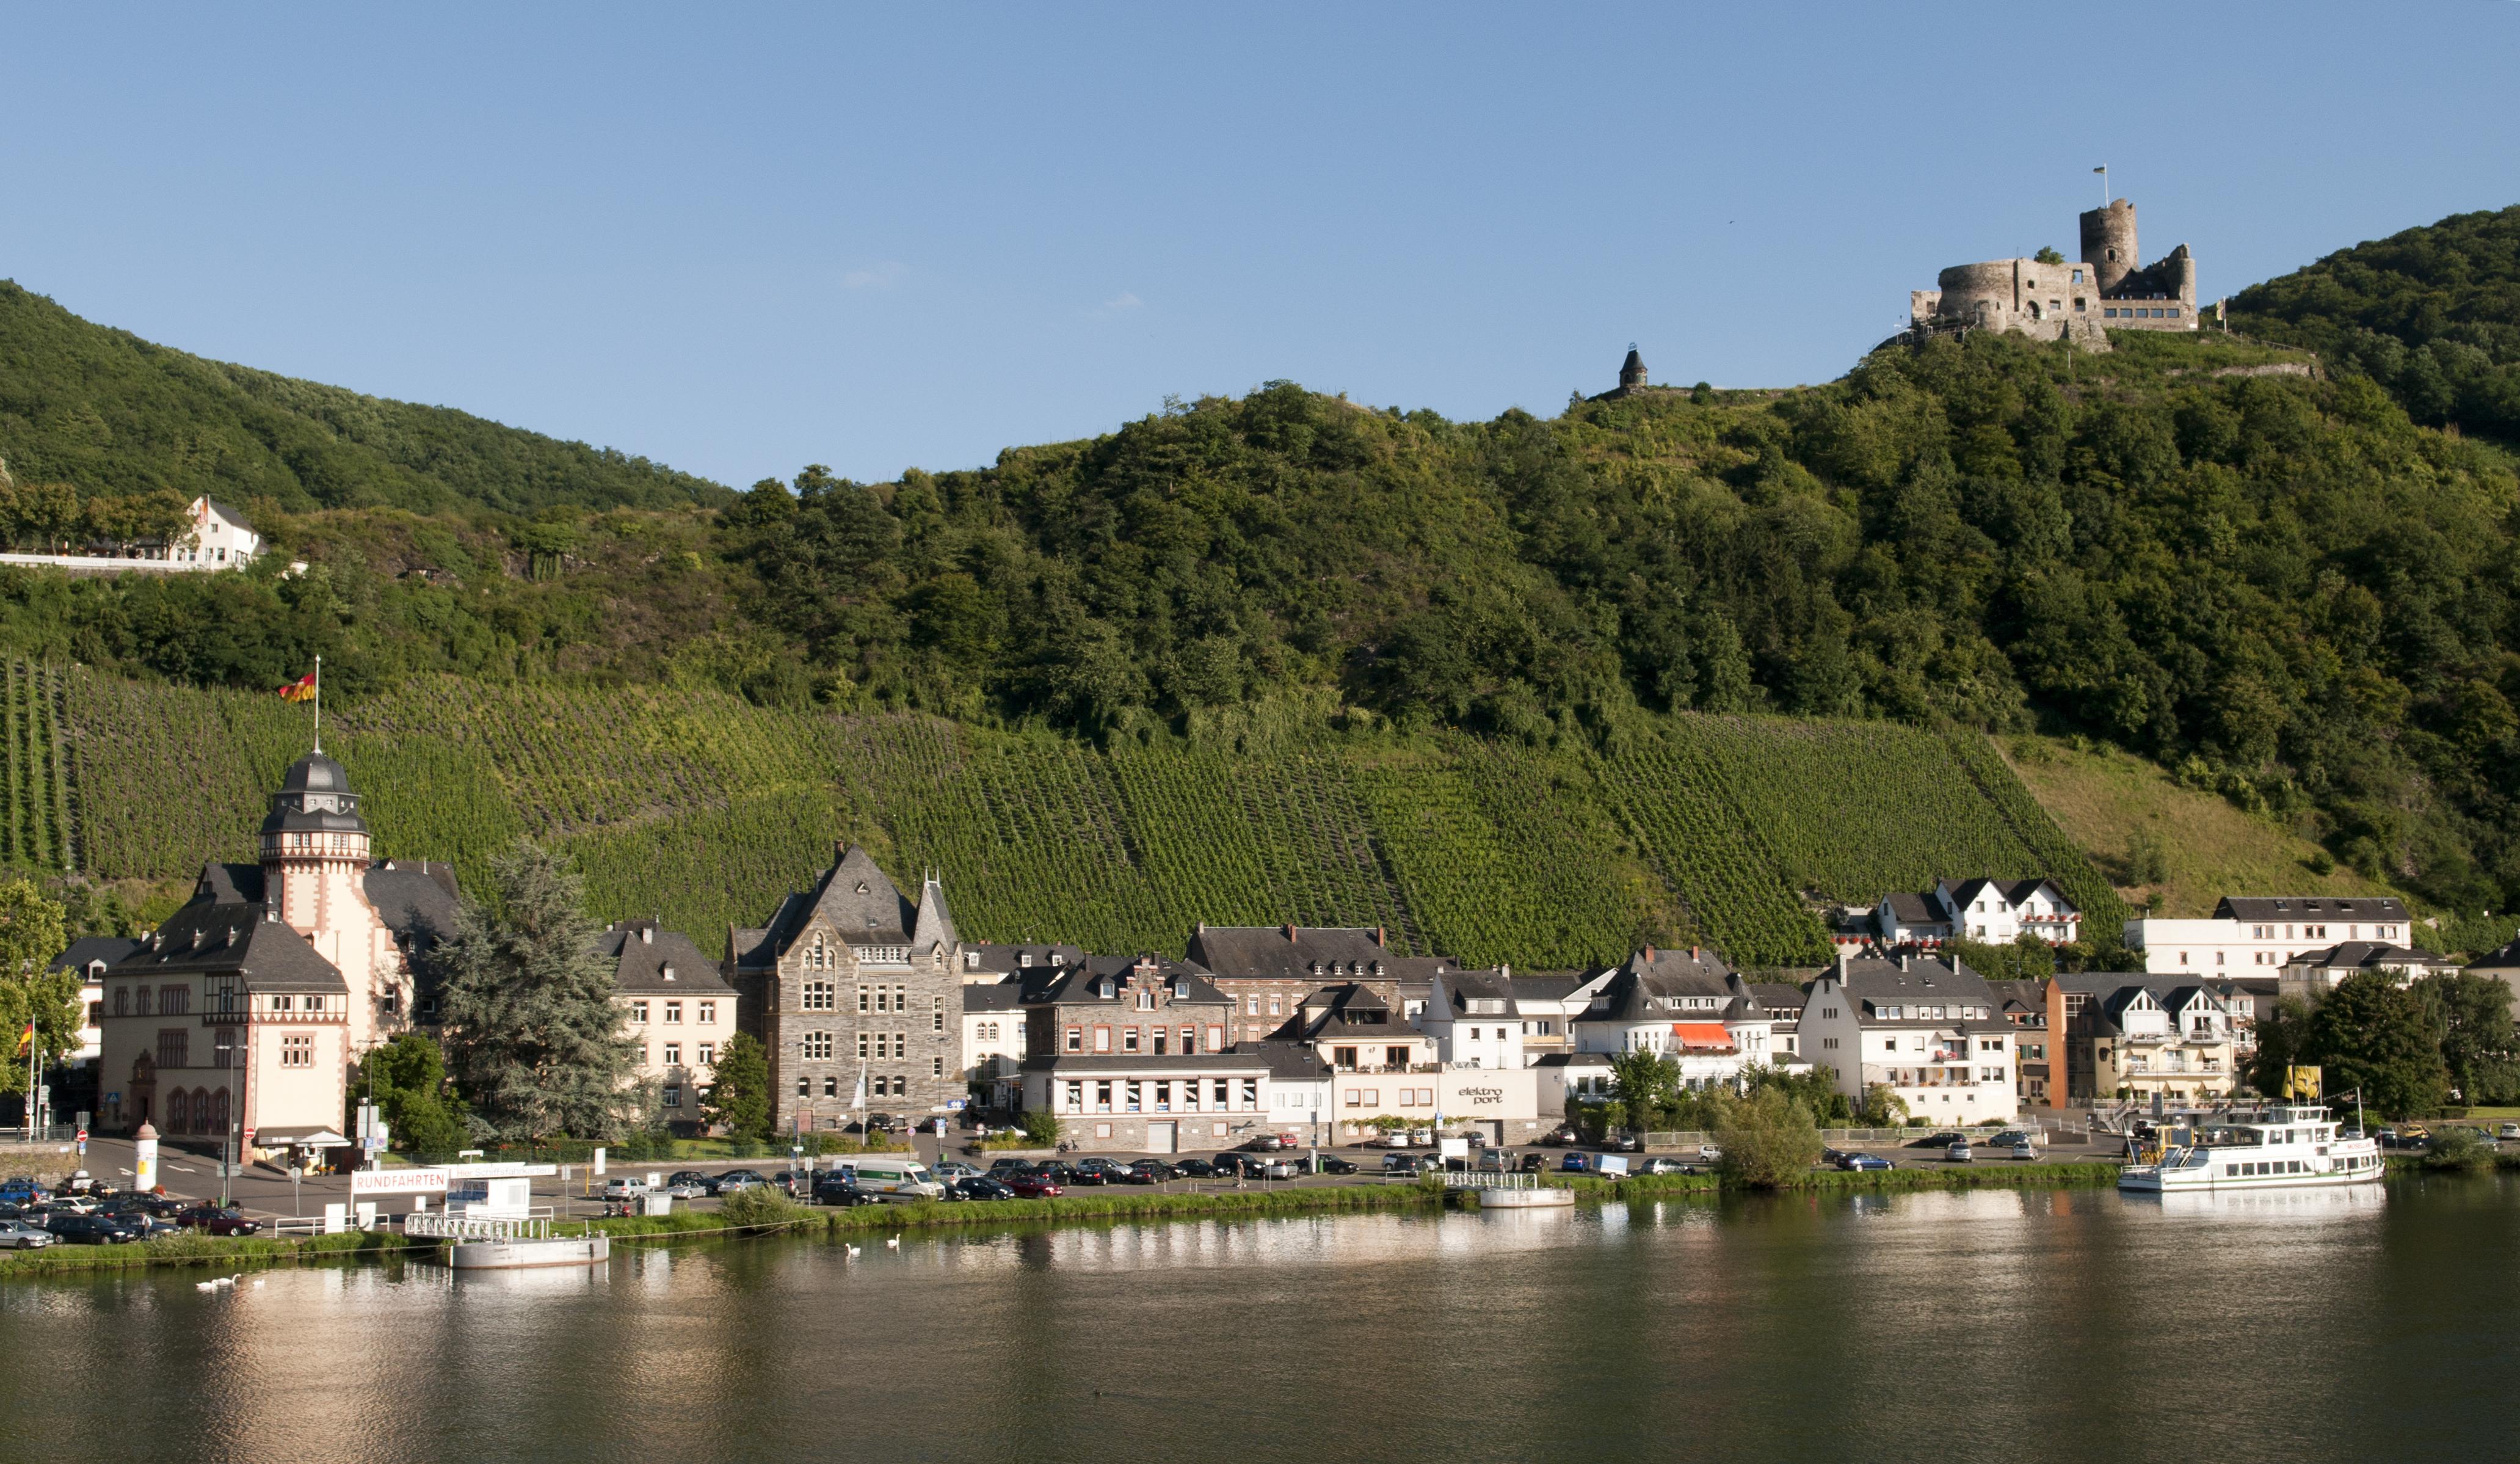 File Bernkastel Kues, Mosel (4935722634) jpg   Wikimedia Commons